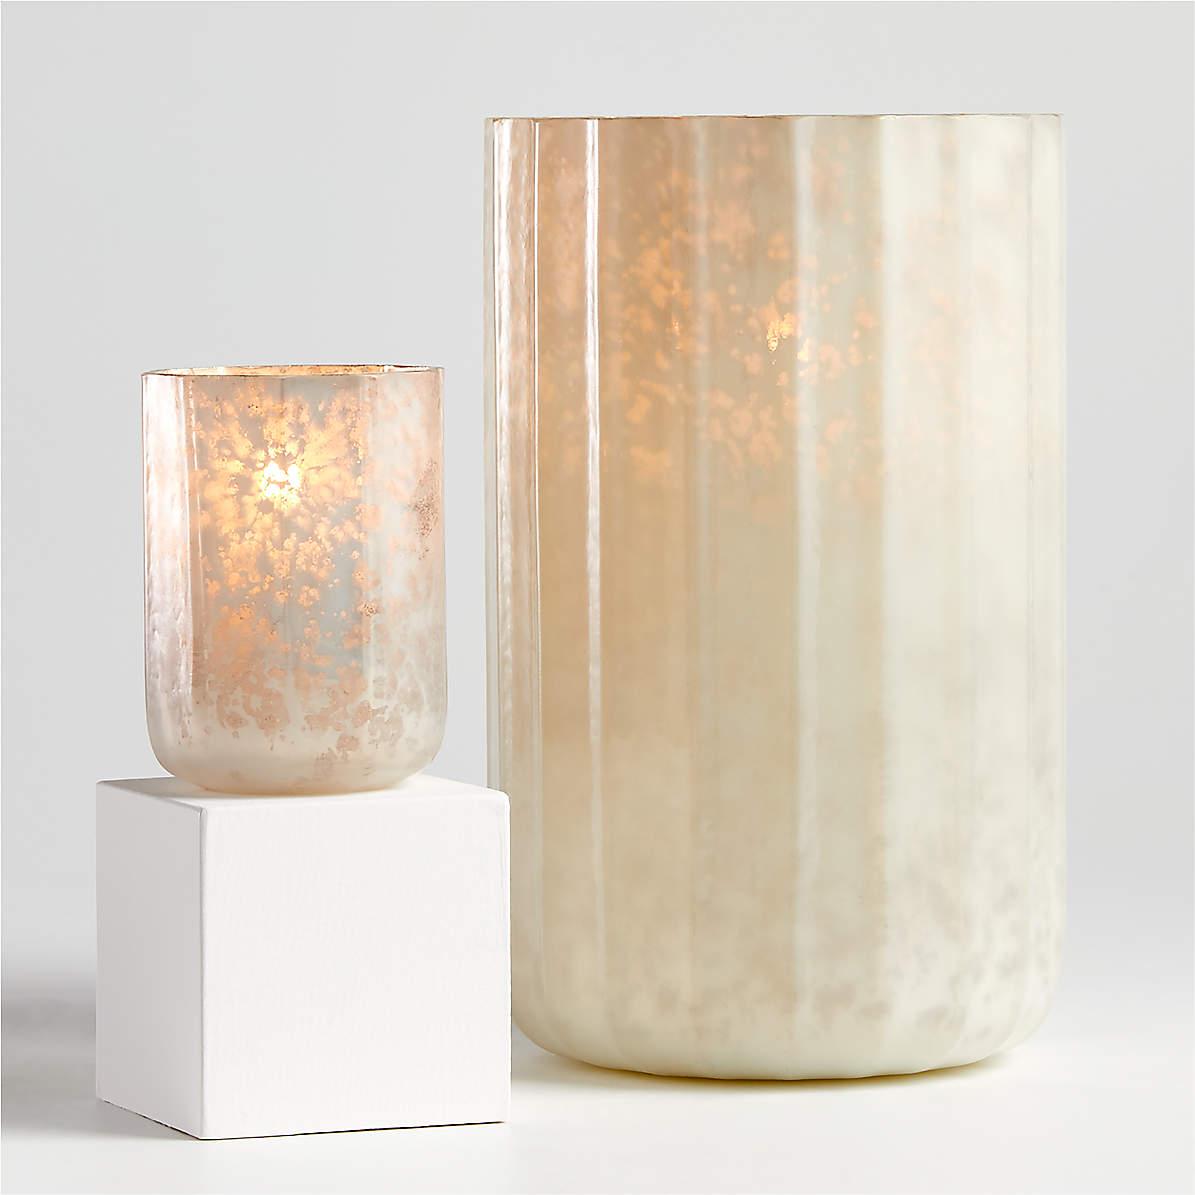 Cumulus White Mercury Glass Candle Holders Crate And Barrel Canada